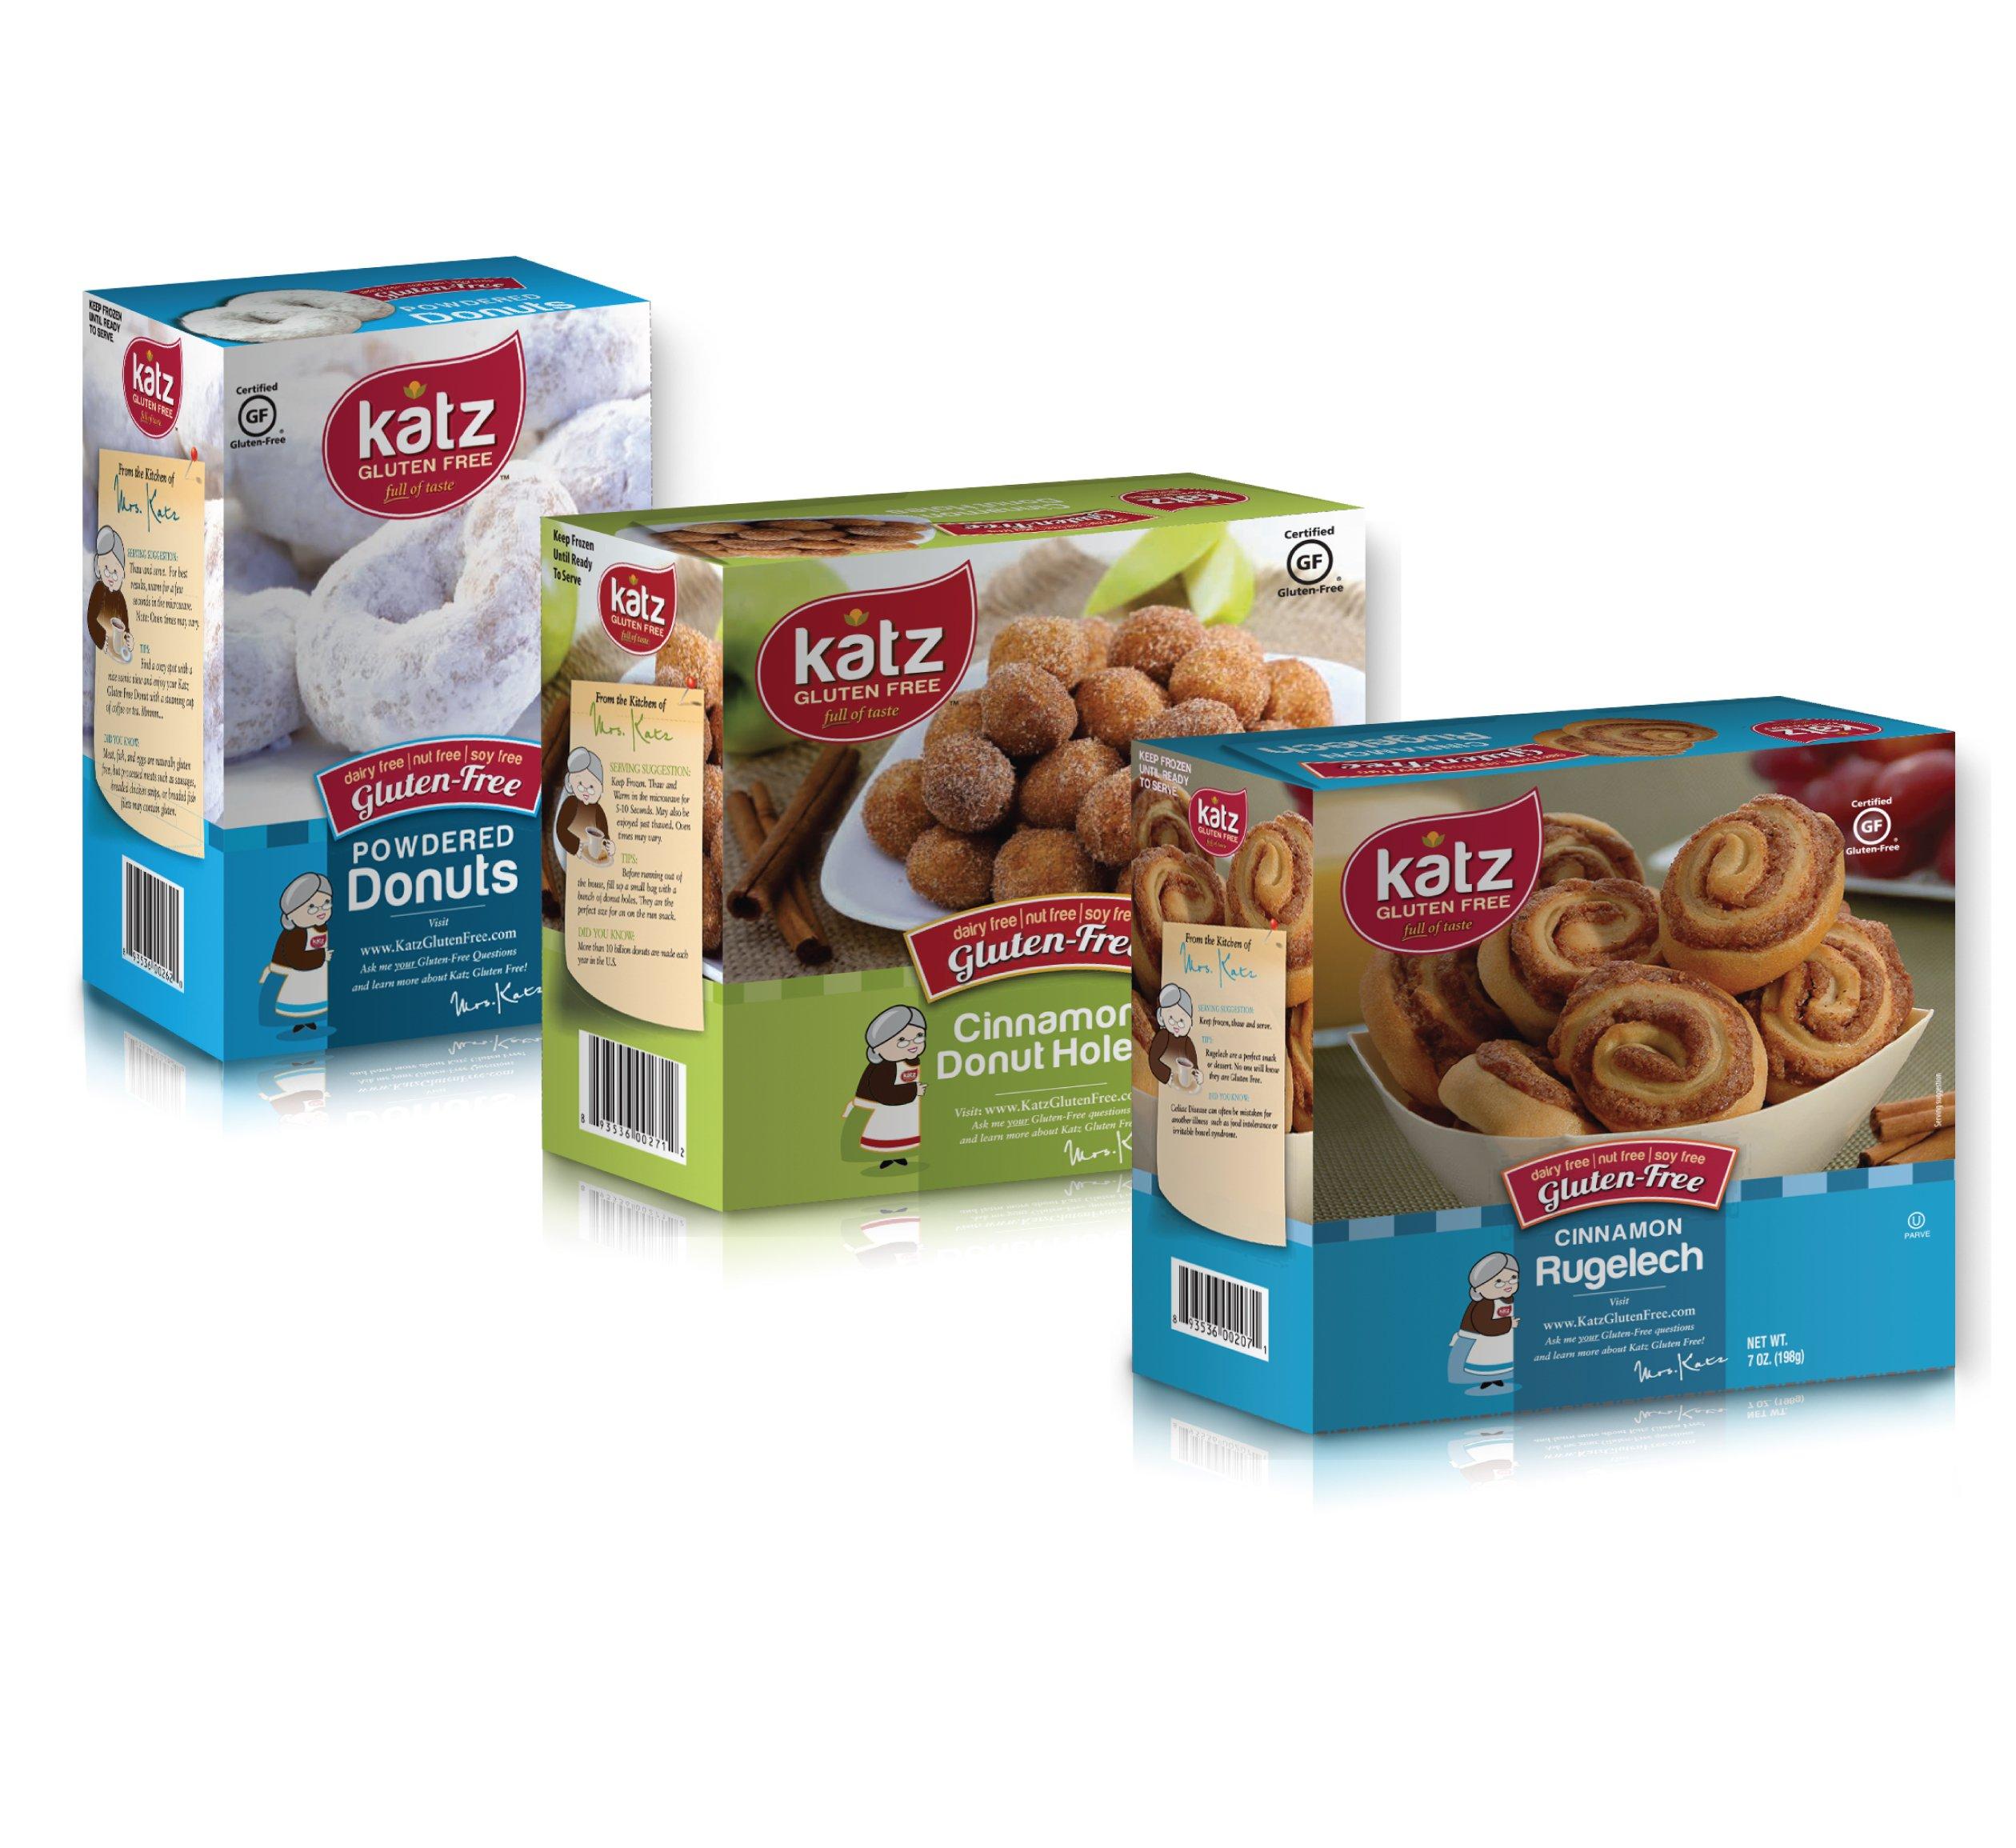 Katz Gluten Free Variety Pack | 1 Cinnamon Rugelach, 1 Powdered Donuts, 1 Cinnamon Donut Holes | Dairy, Nut, Soy and Gluten Free | Kosher (1 Pack of each) by Katz Gluten Free